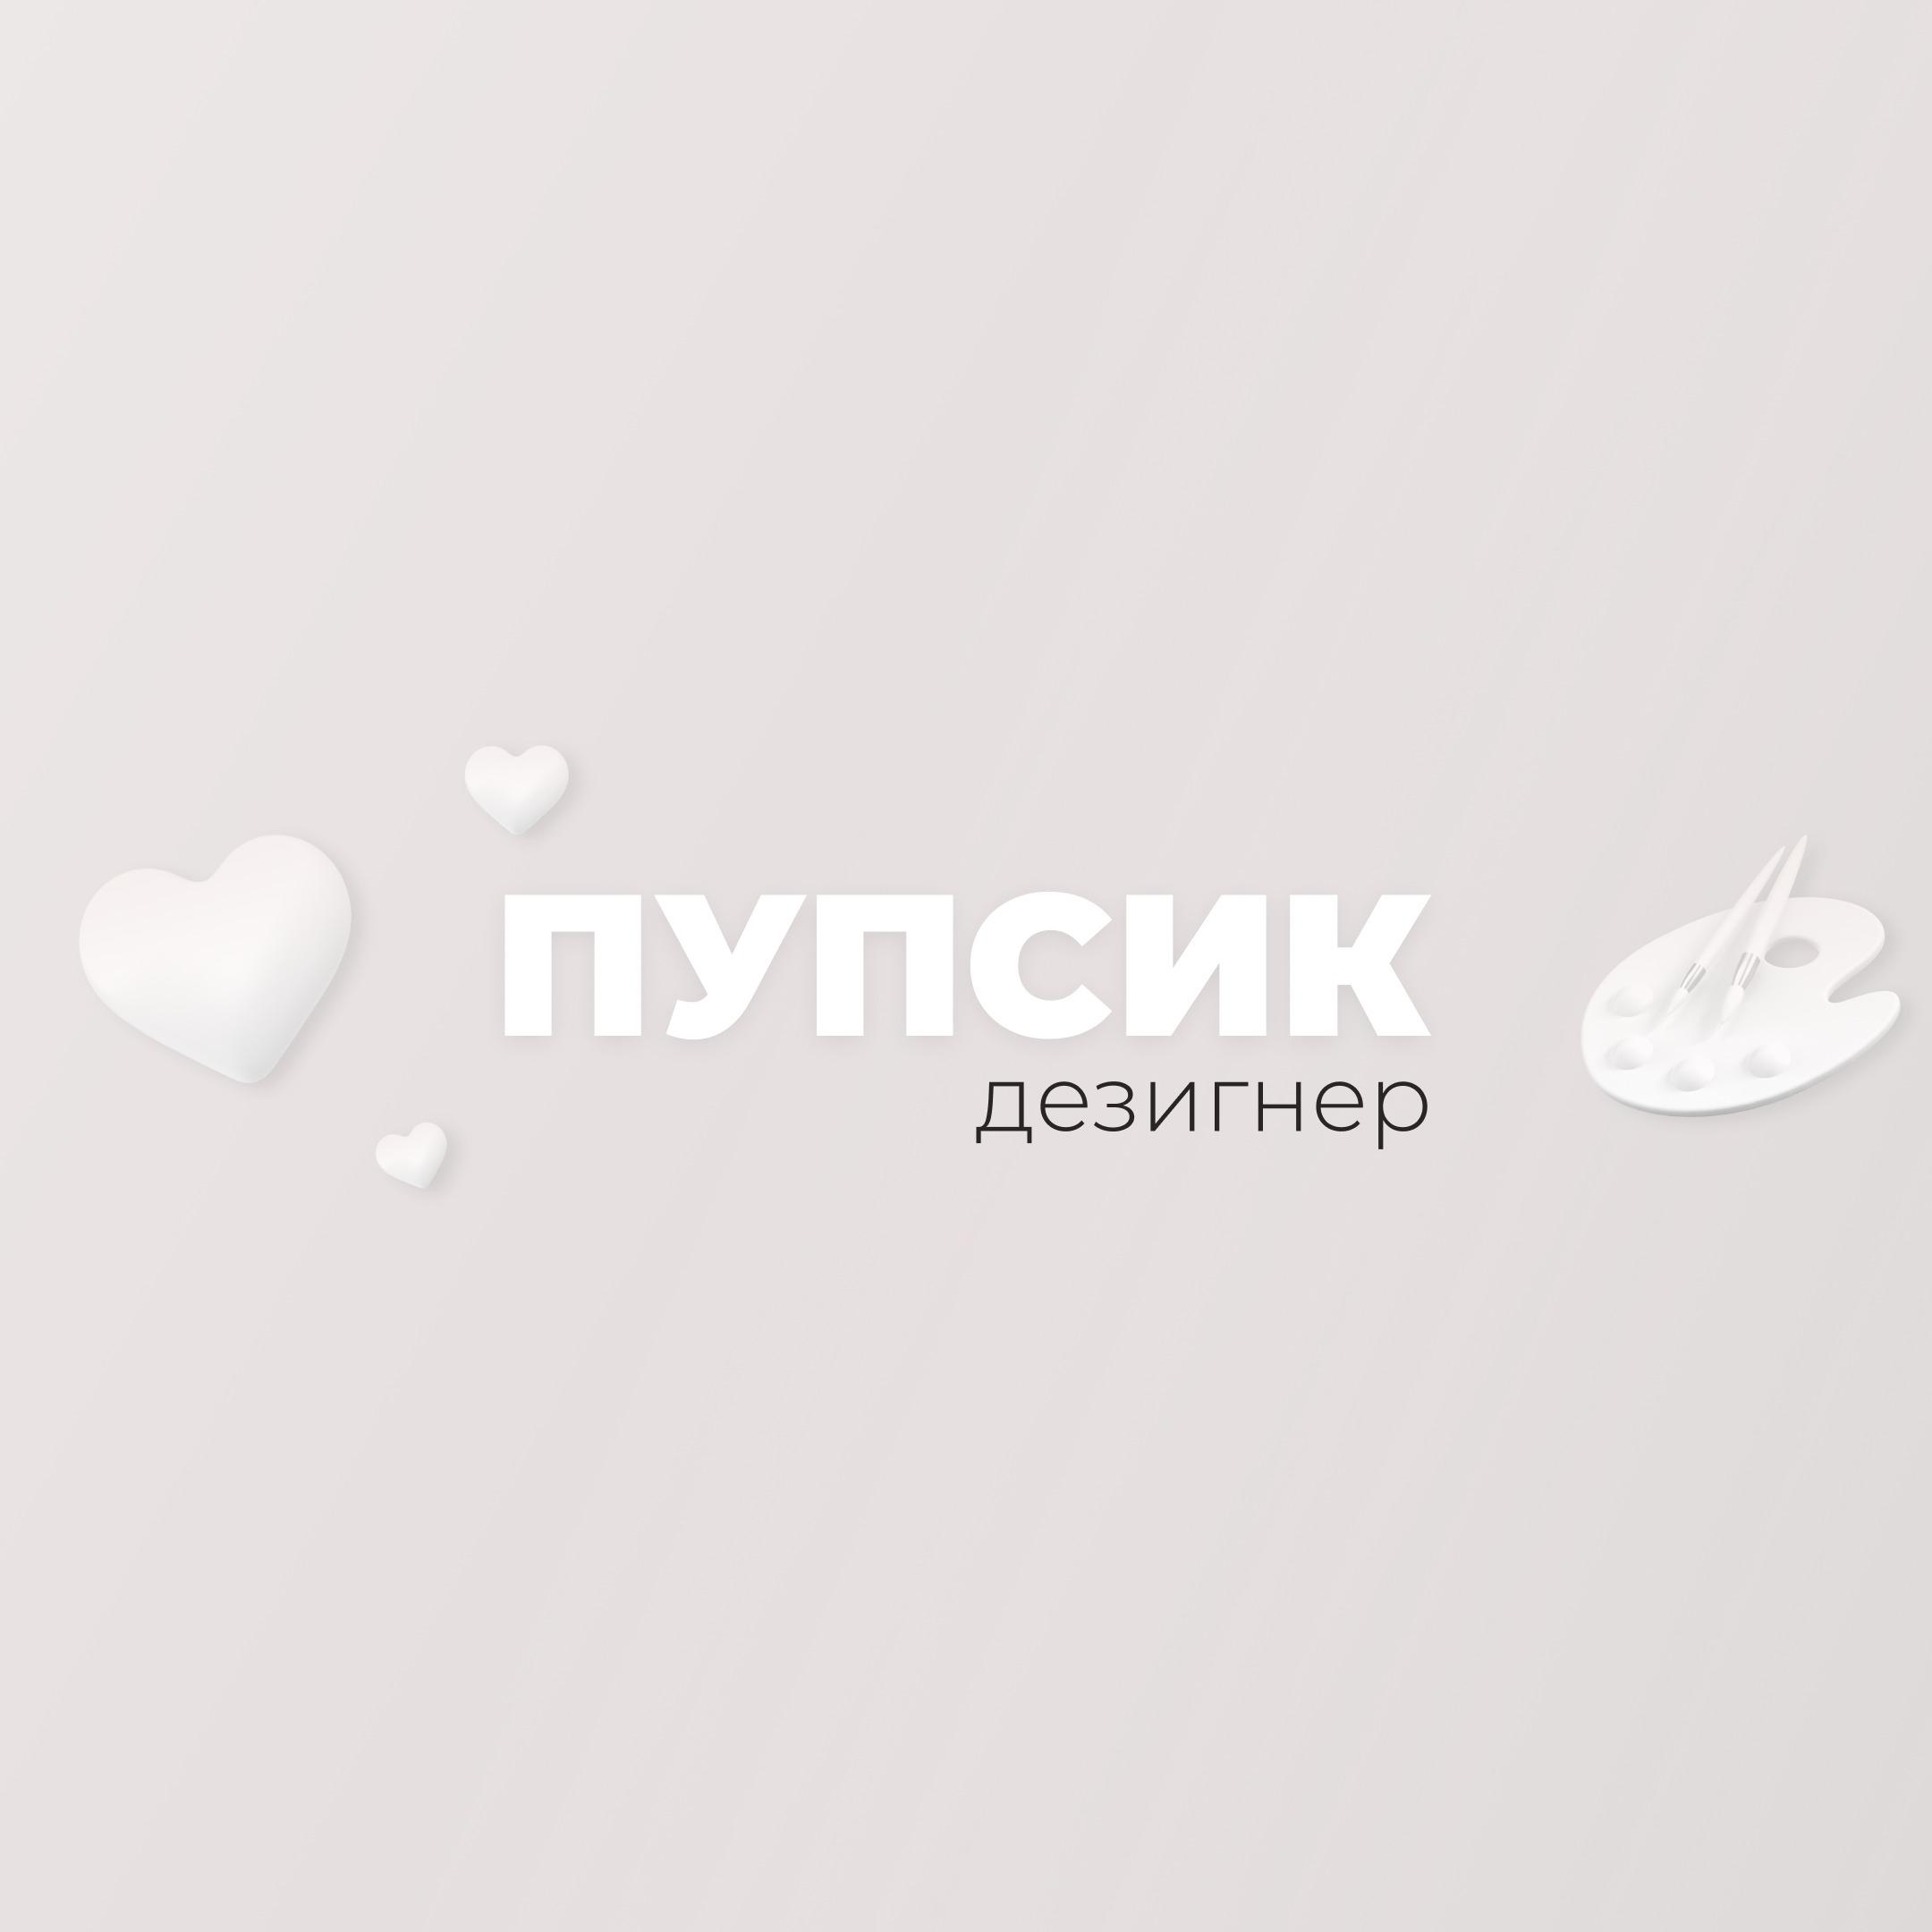 vipveronika24